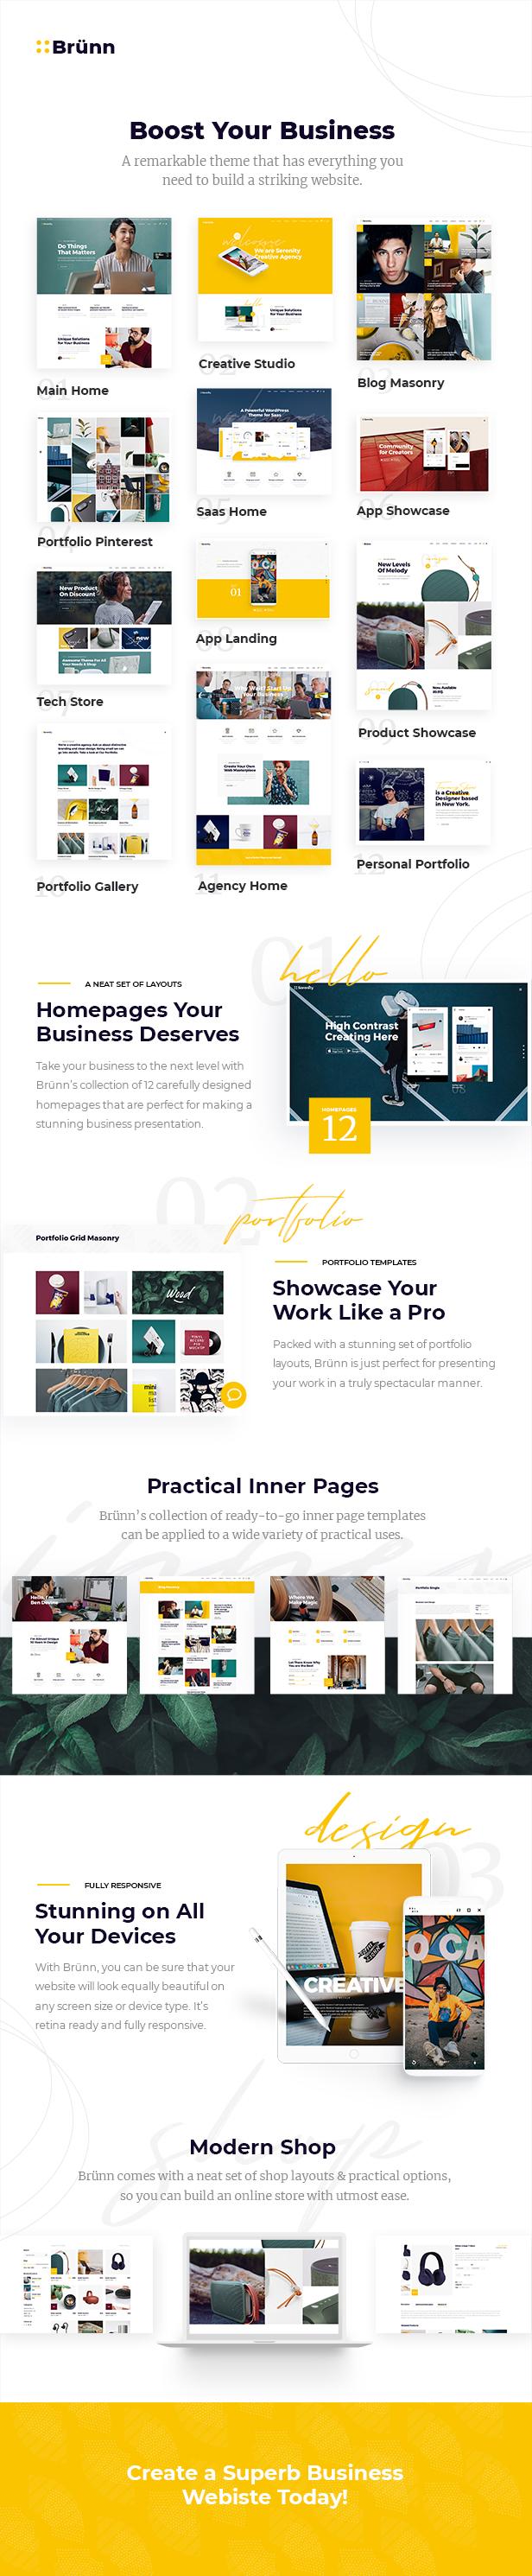 Brünn Wordpress Creative Agency Theme Review